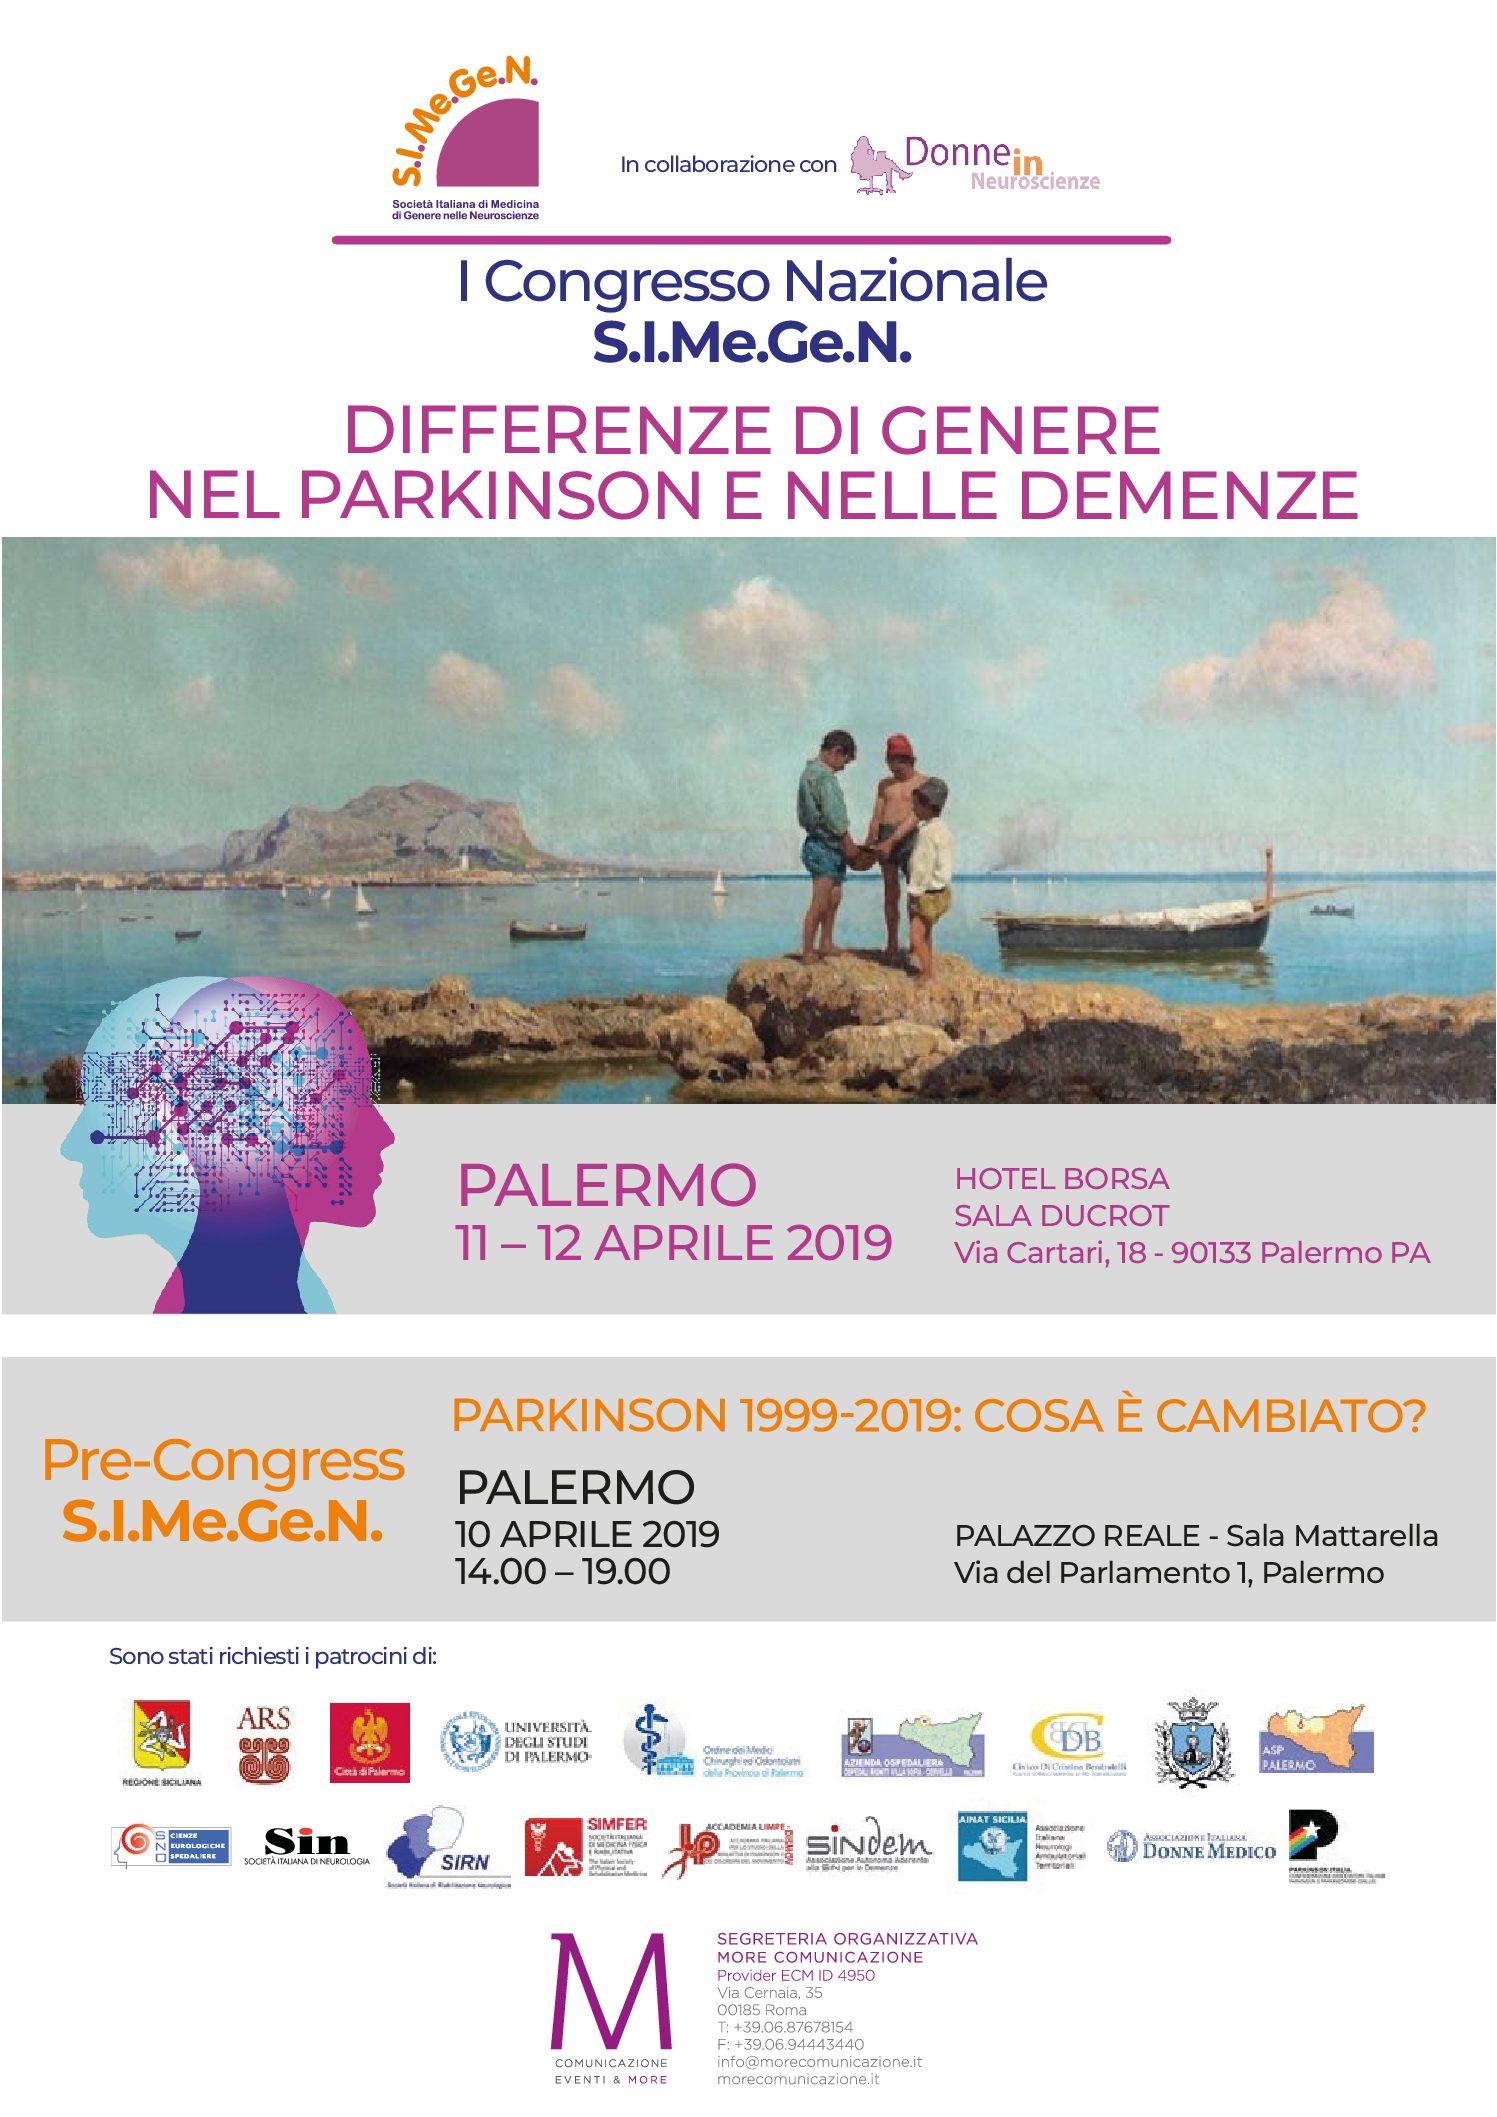 "Malattie neurologiche e differenze di genere. Kermesse di Donne in Neuroscienze e S.I.Me.Ge.N. su ""Parkinson, 1999-2019, cosa è cambiato?"""